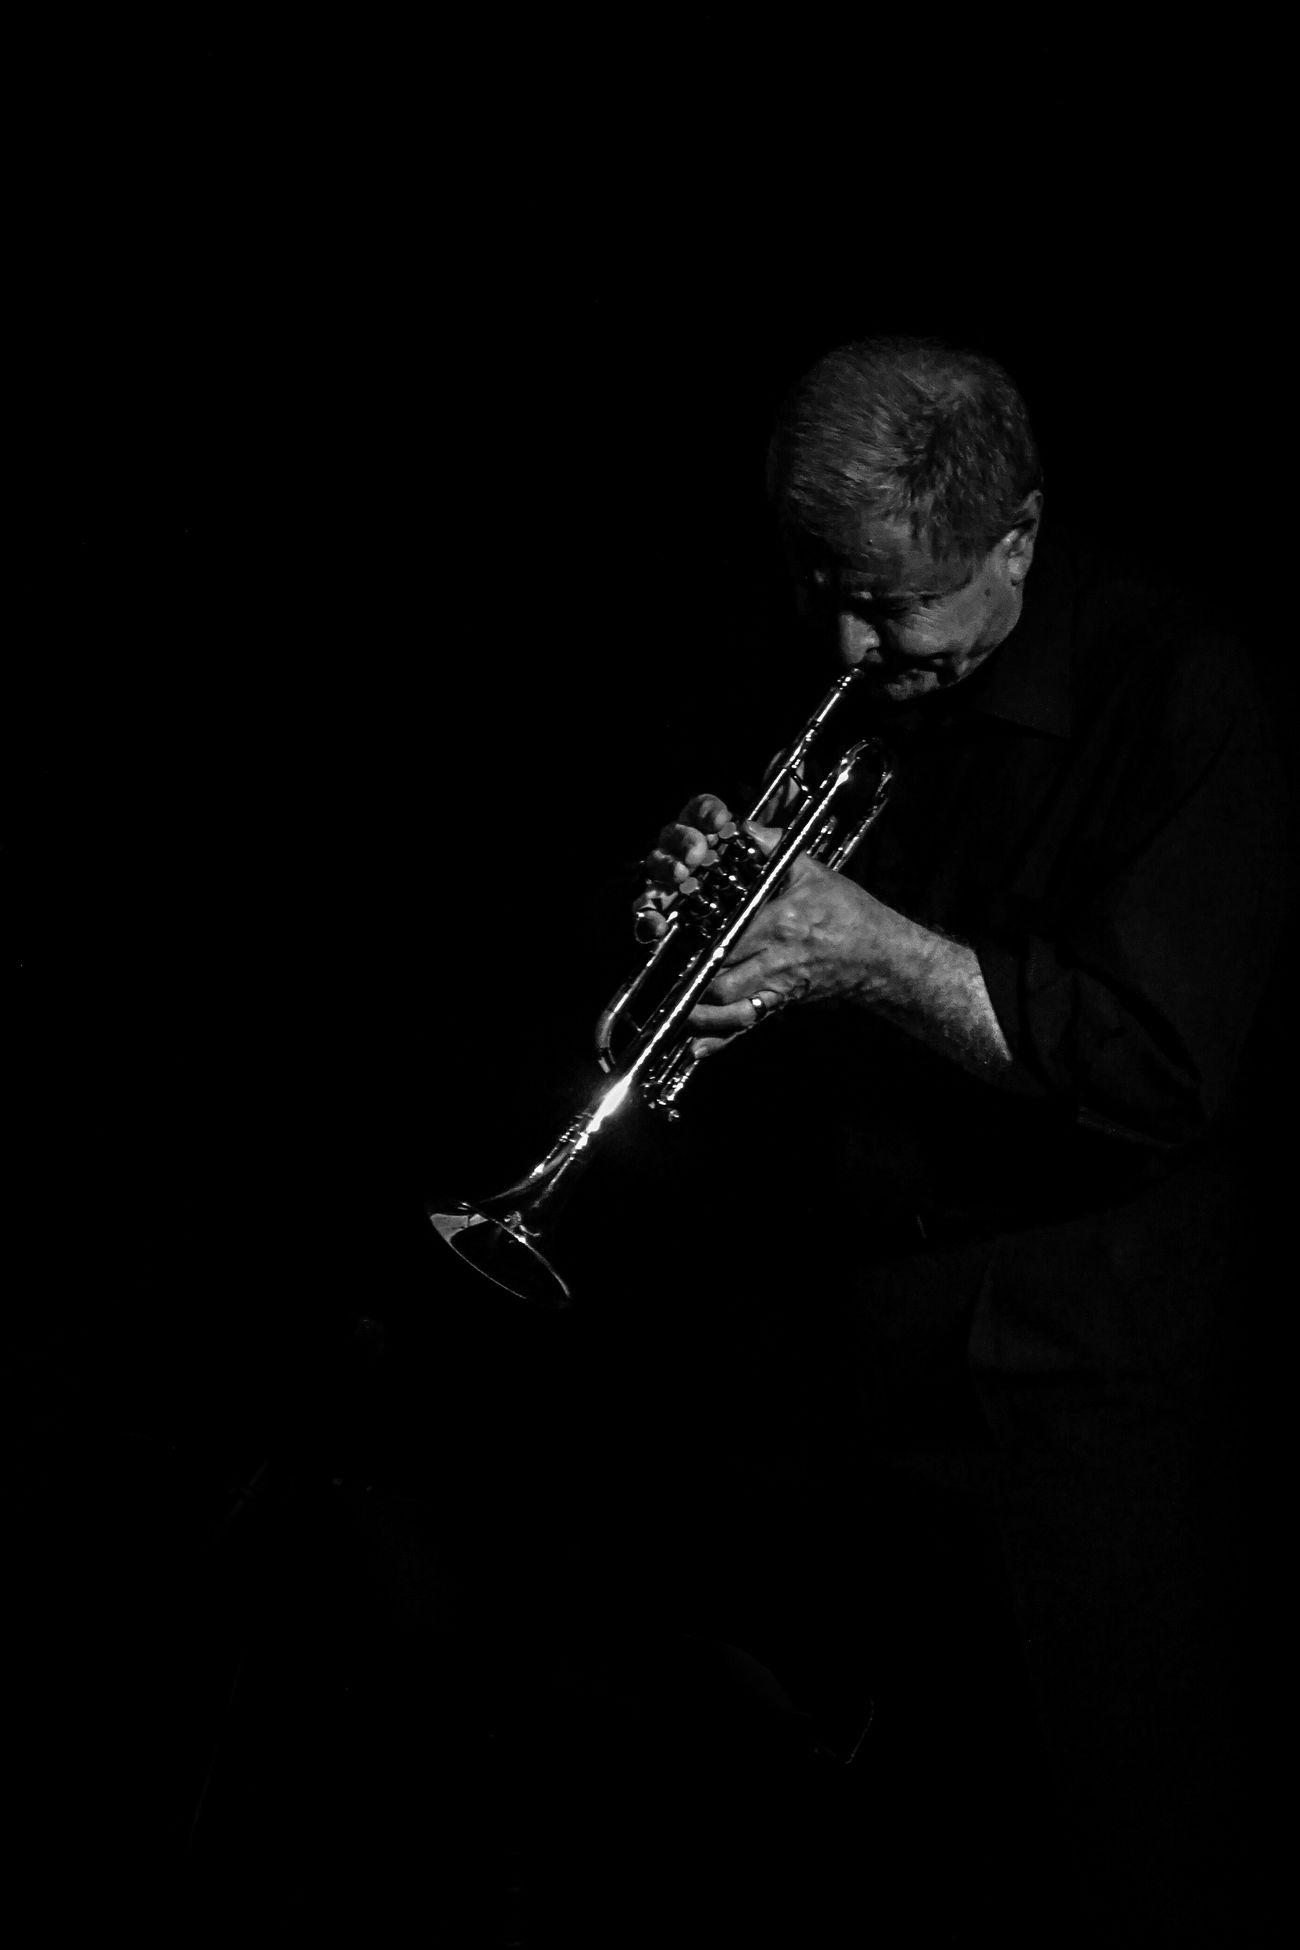 State Of Mind  Musician Trumpet Black&white Portrait A6000 B&W Portrait The Portraitist - 2015 EyeEm Awards